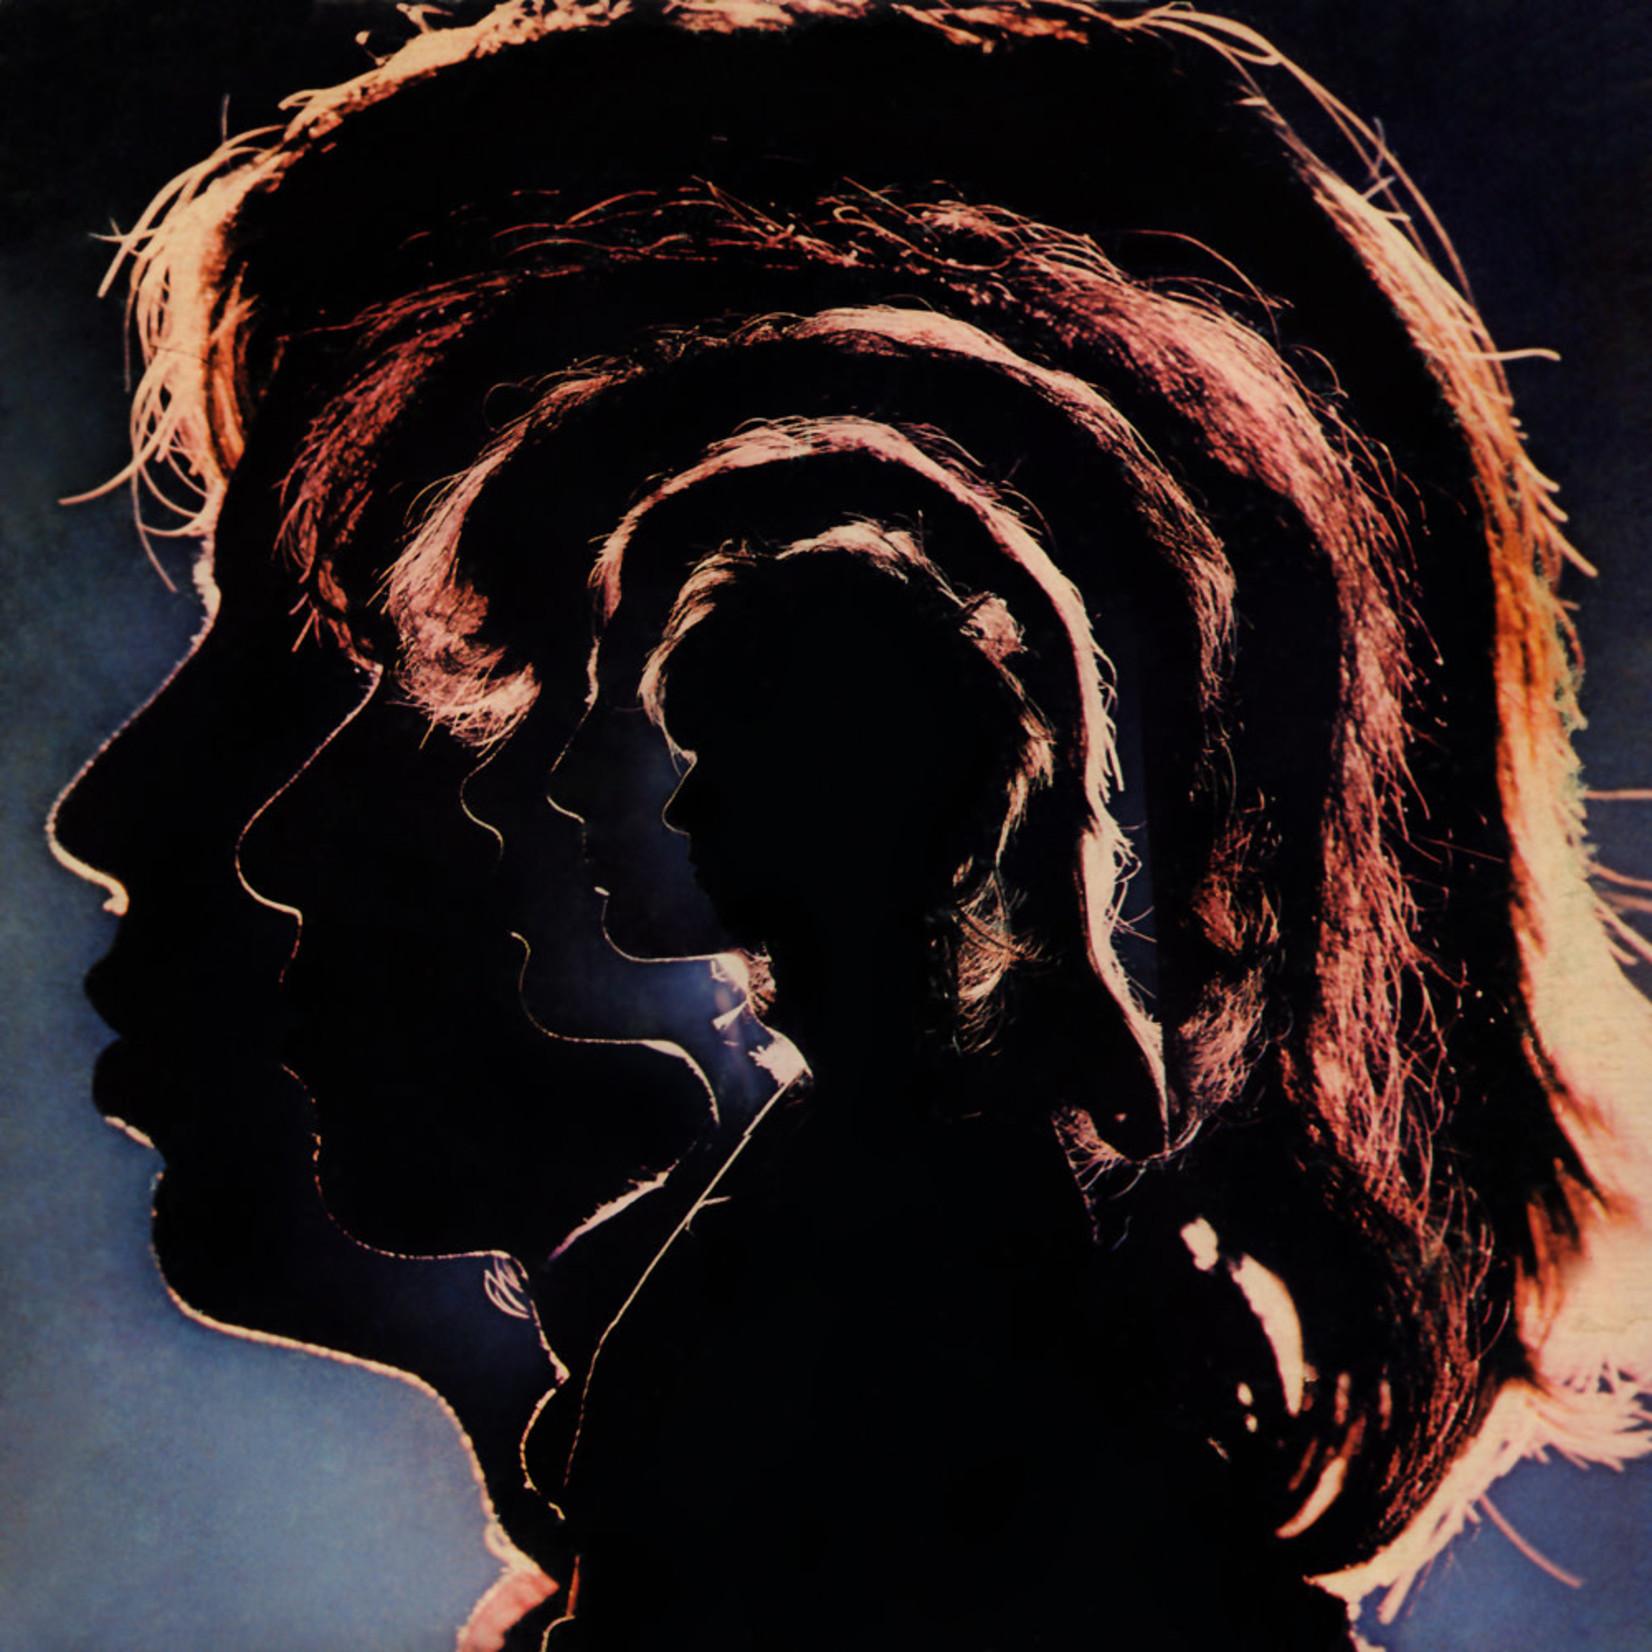 Vinyl The Rolling Stones - Hot Rocks 1964-1971